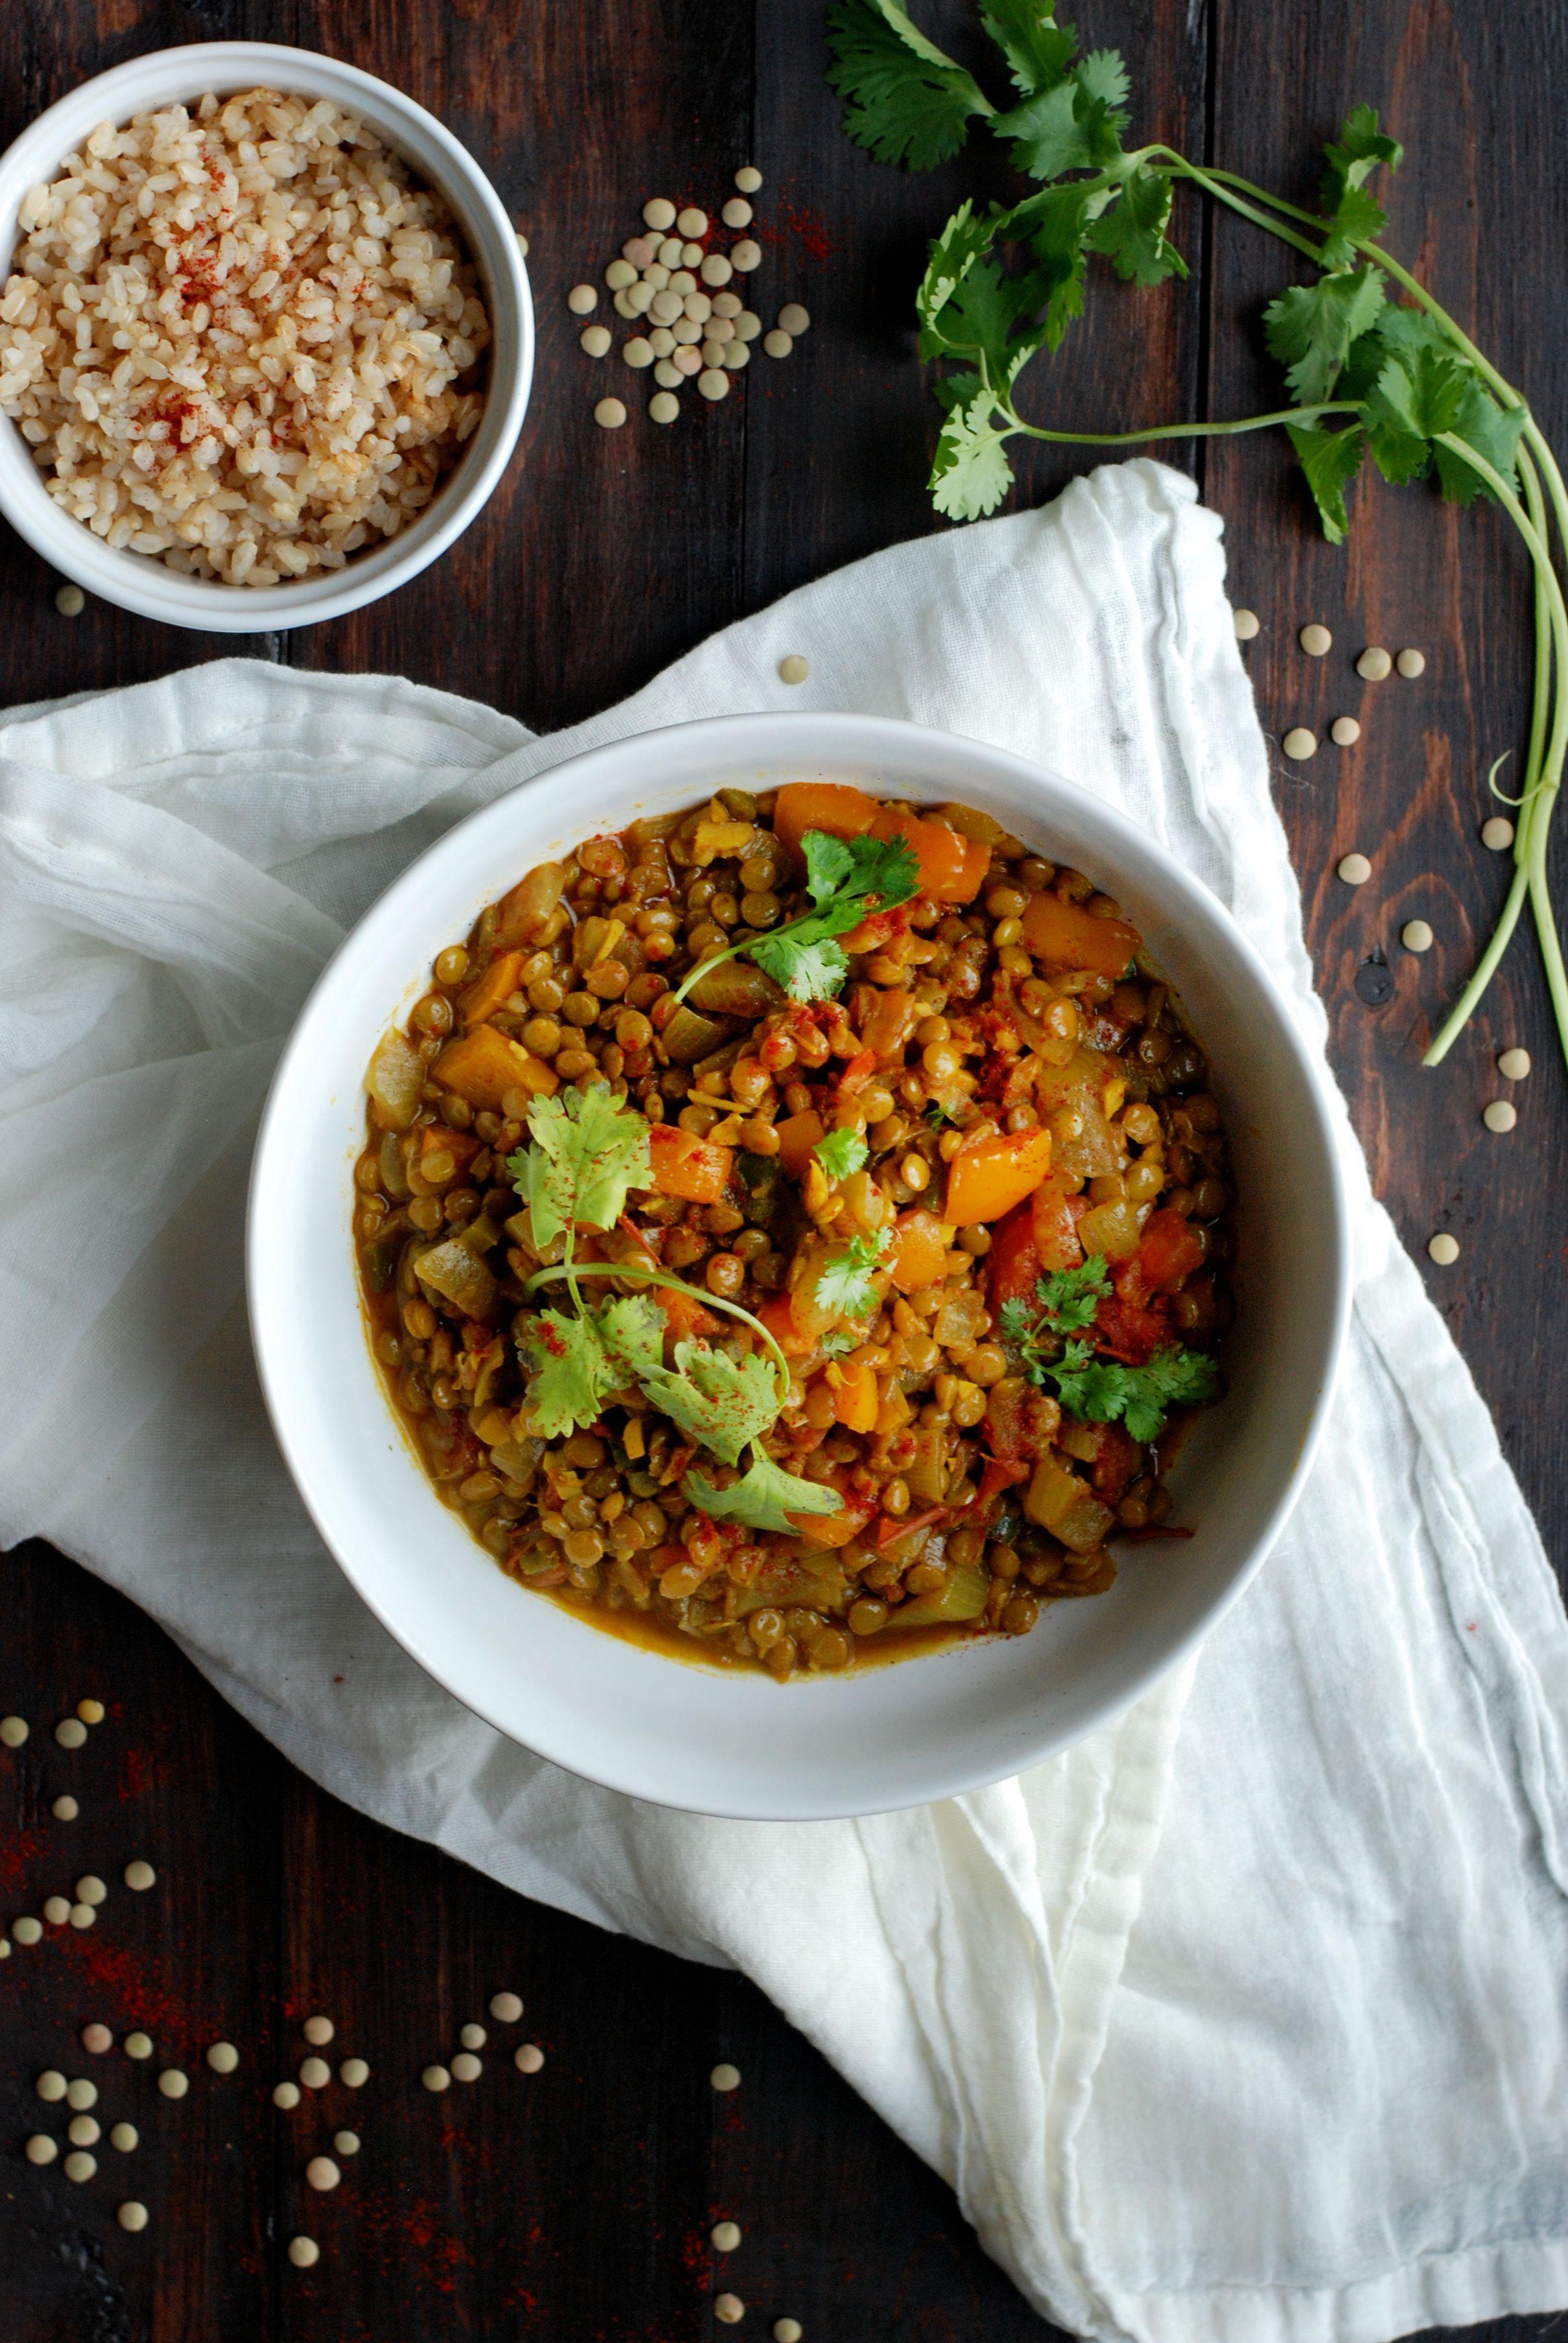 Jamaican lentils culinaryluv pinterest lentils jamaican jamaican lentils healthy gluten free recipesvegan food forumfinder Gallery